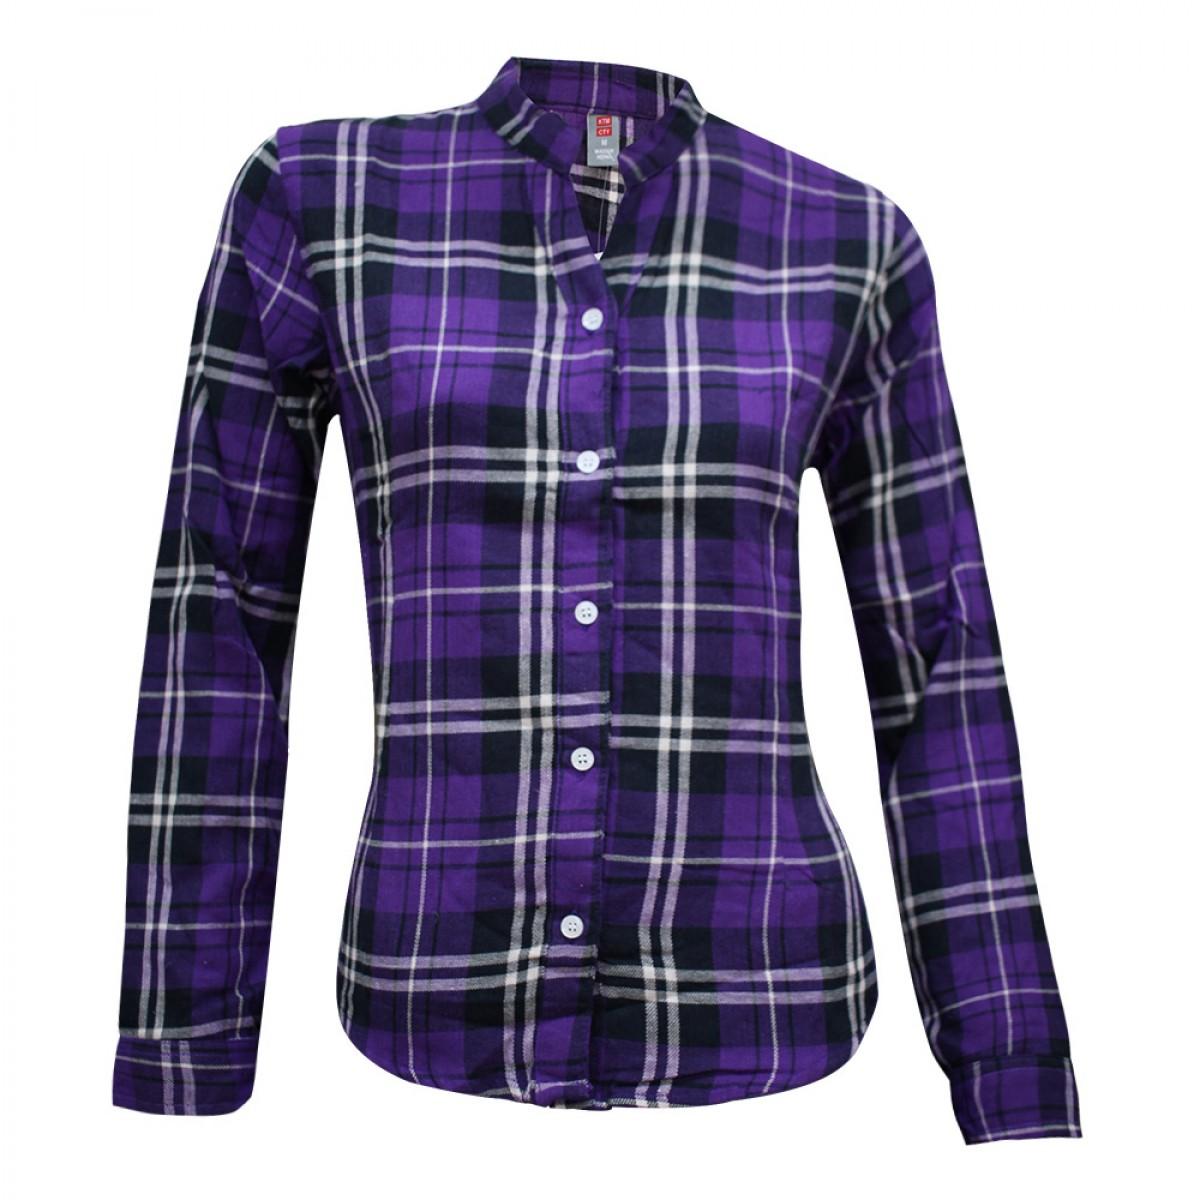 women-cotton-checked-shirt-kcs96681-9a